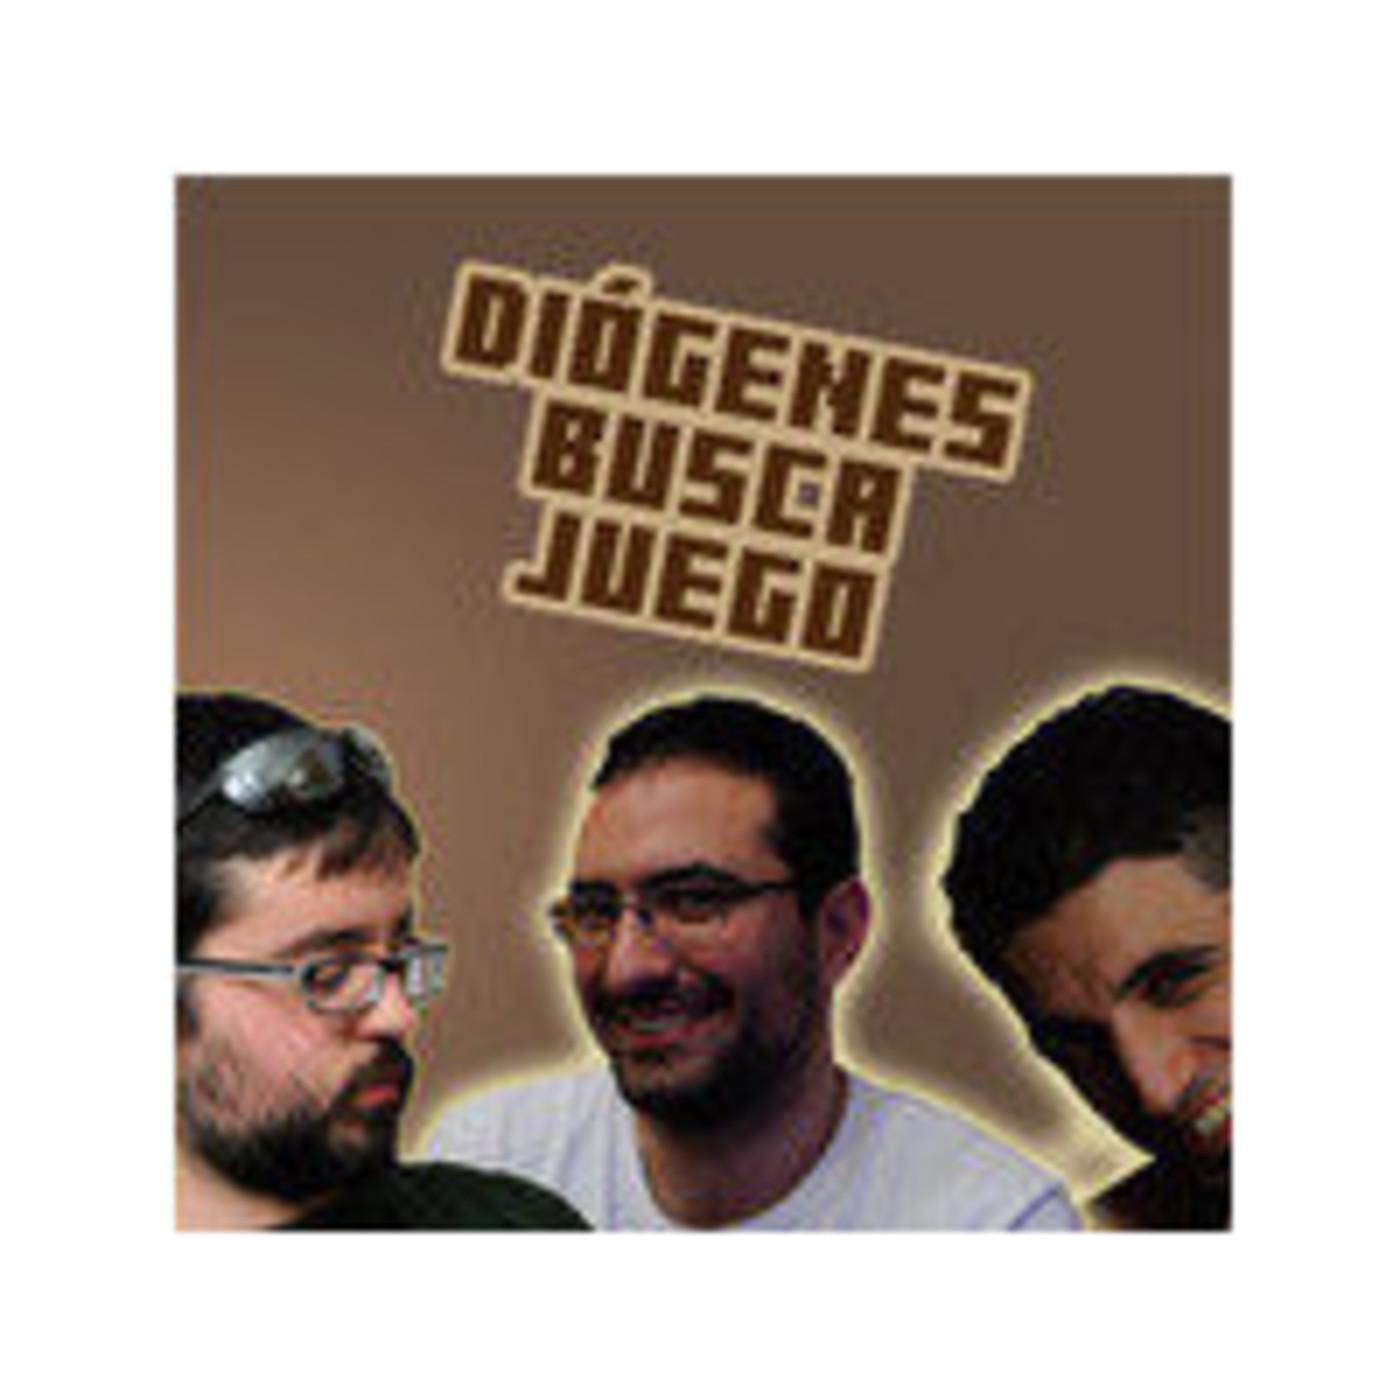 Podcast: Diógenes Busca Juego 03 – Guerra de Miniaturas